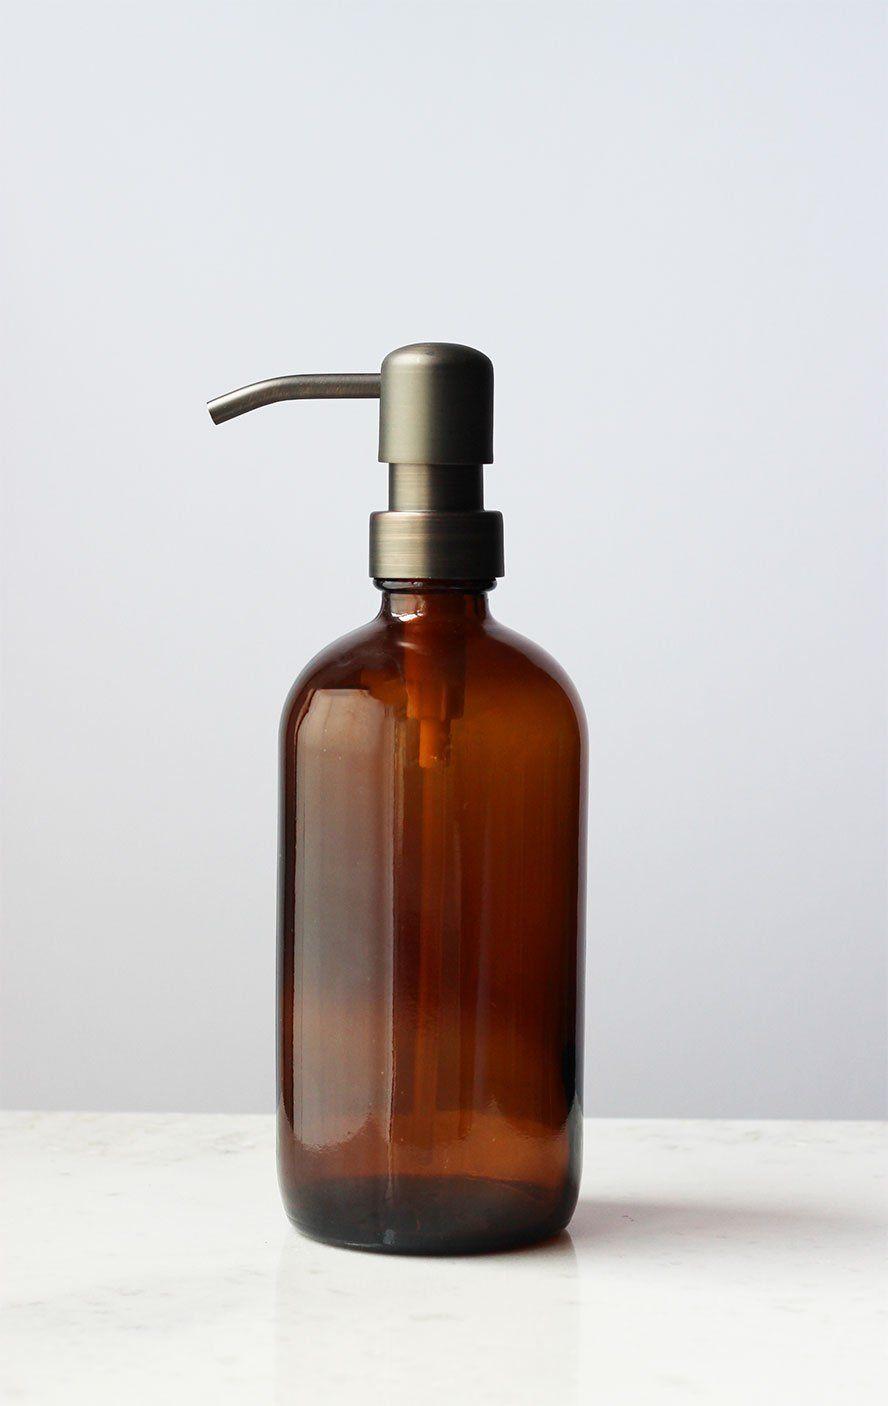 Amazon.com - Farmhouse Glass Soap Dispenser (Amber Glass Bronze Pump ...